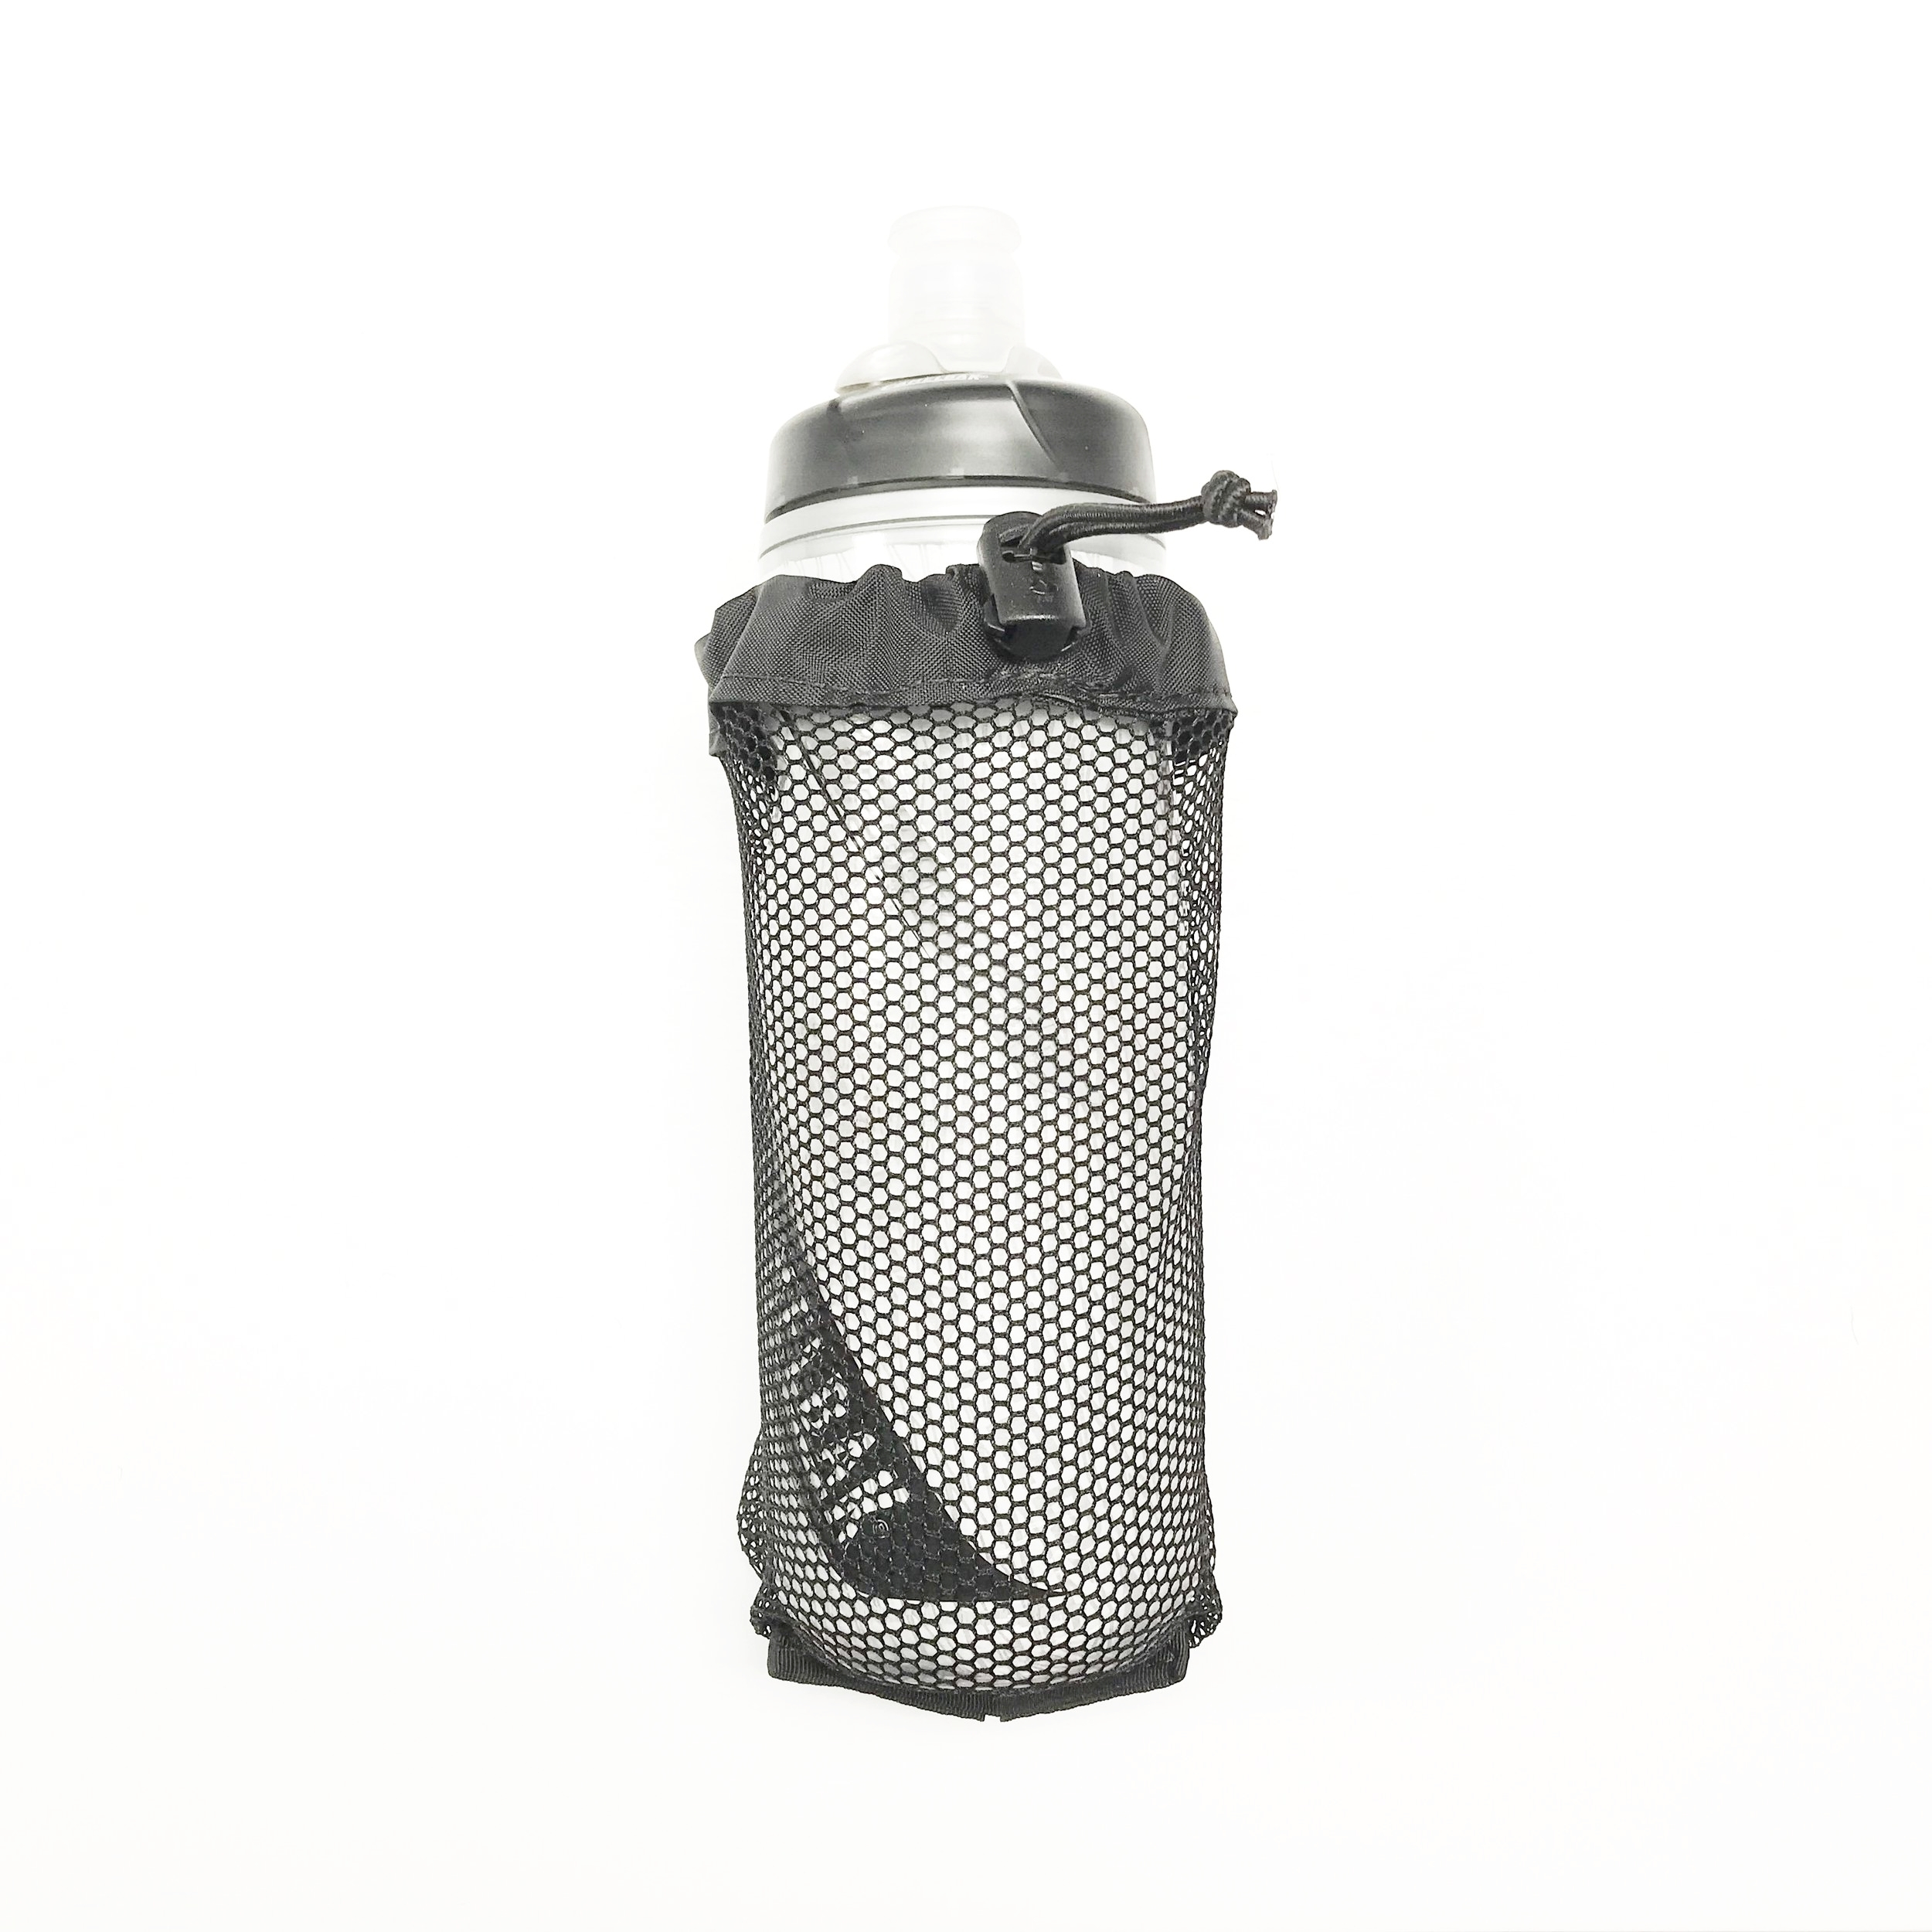 Mesh Water Bottle / Phone Pocket $12